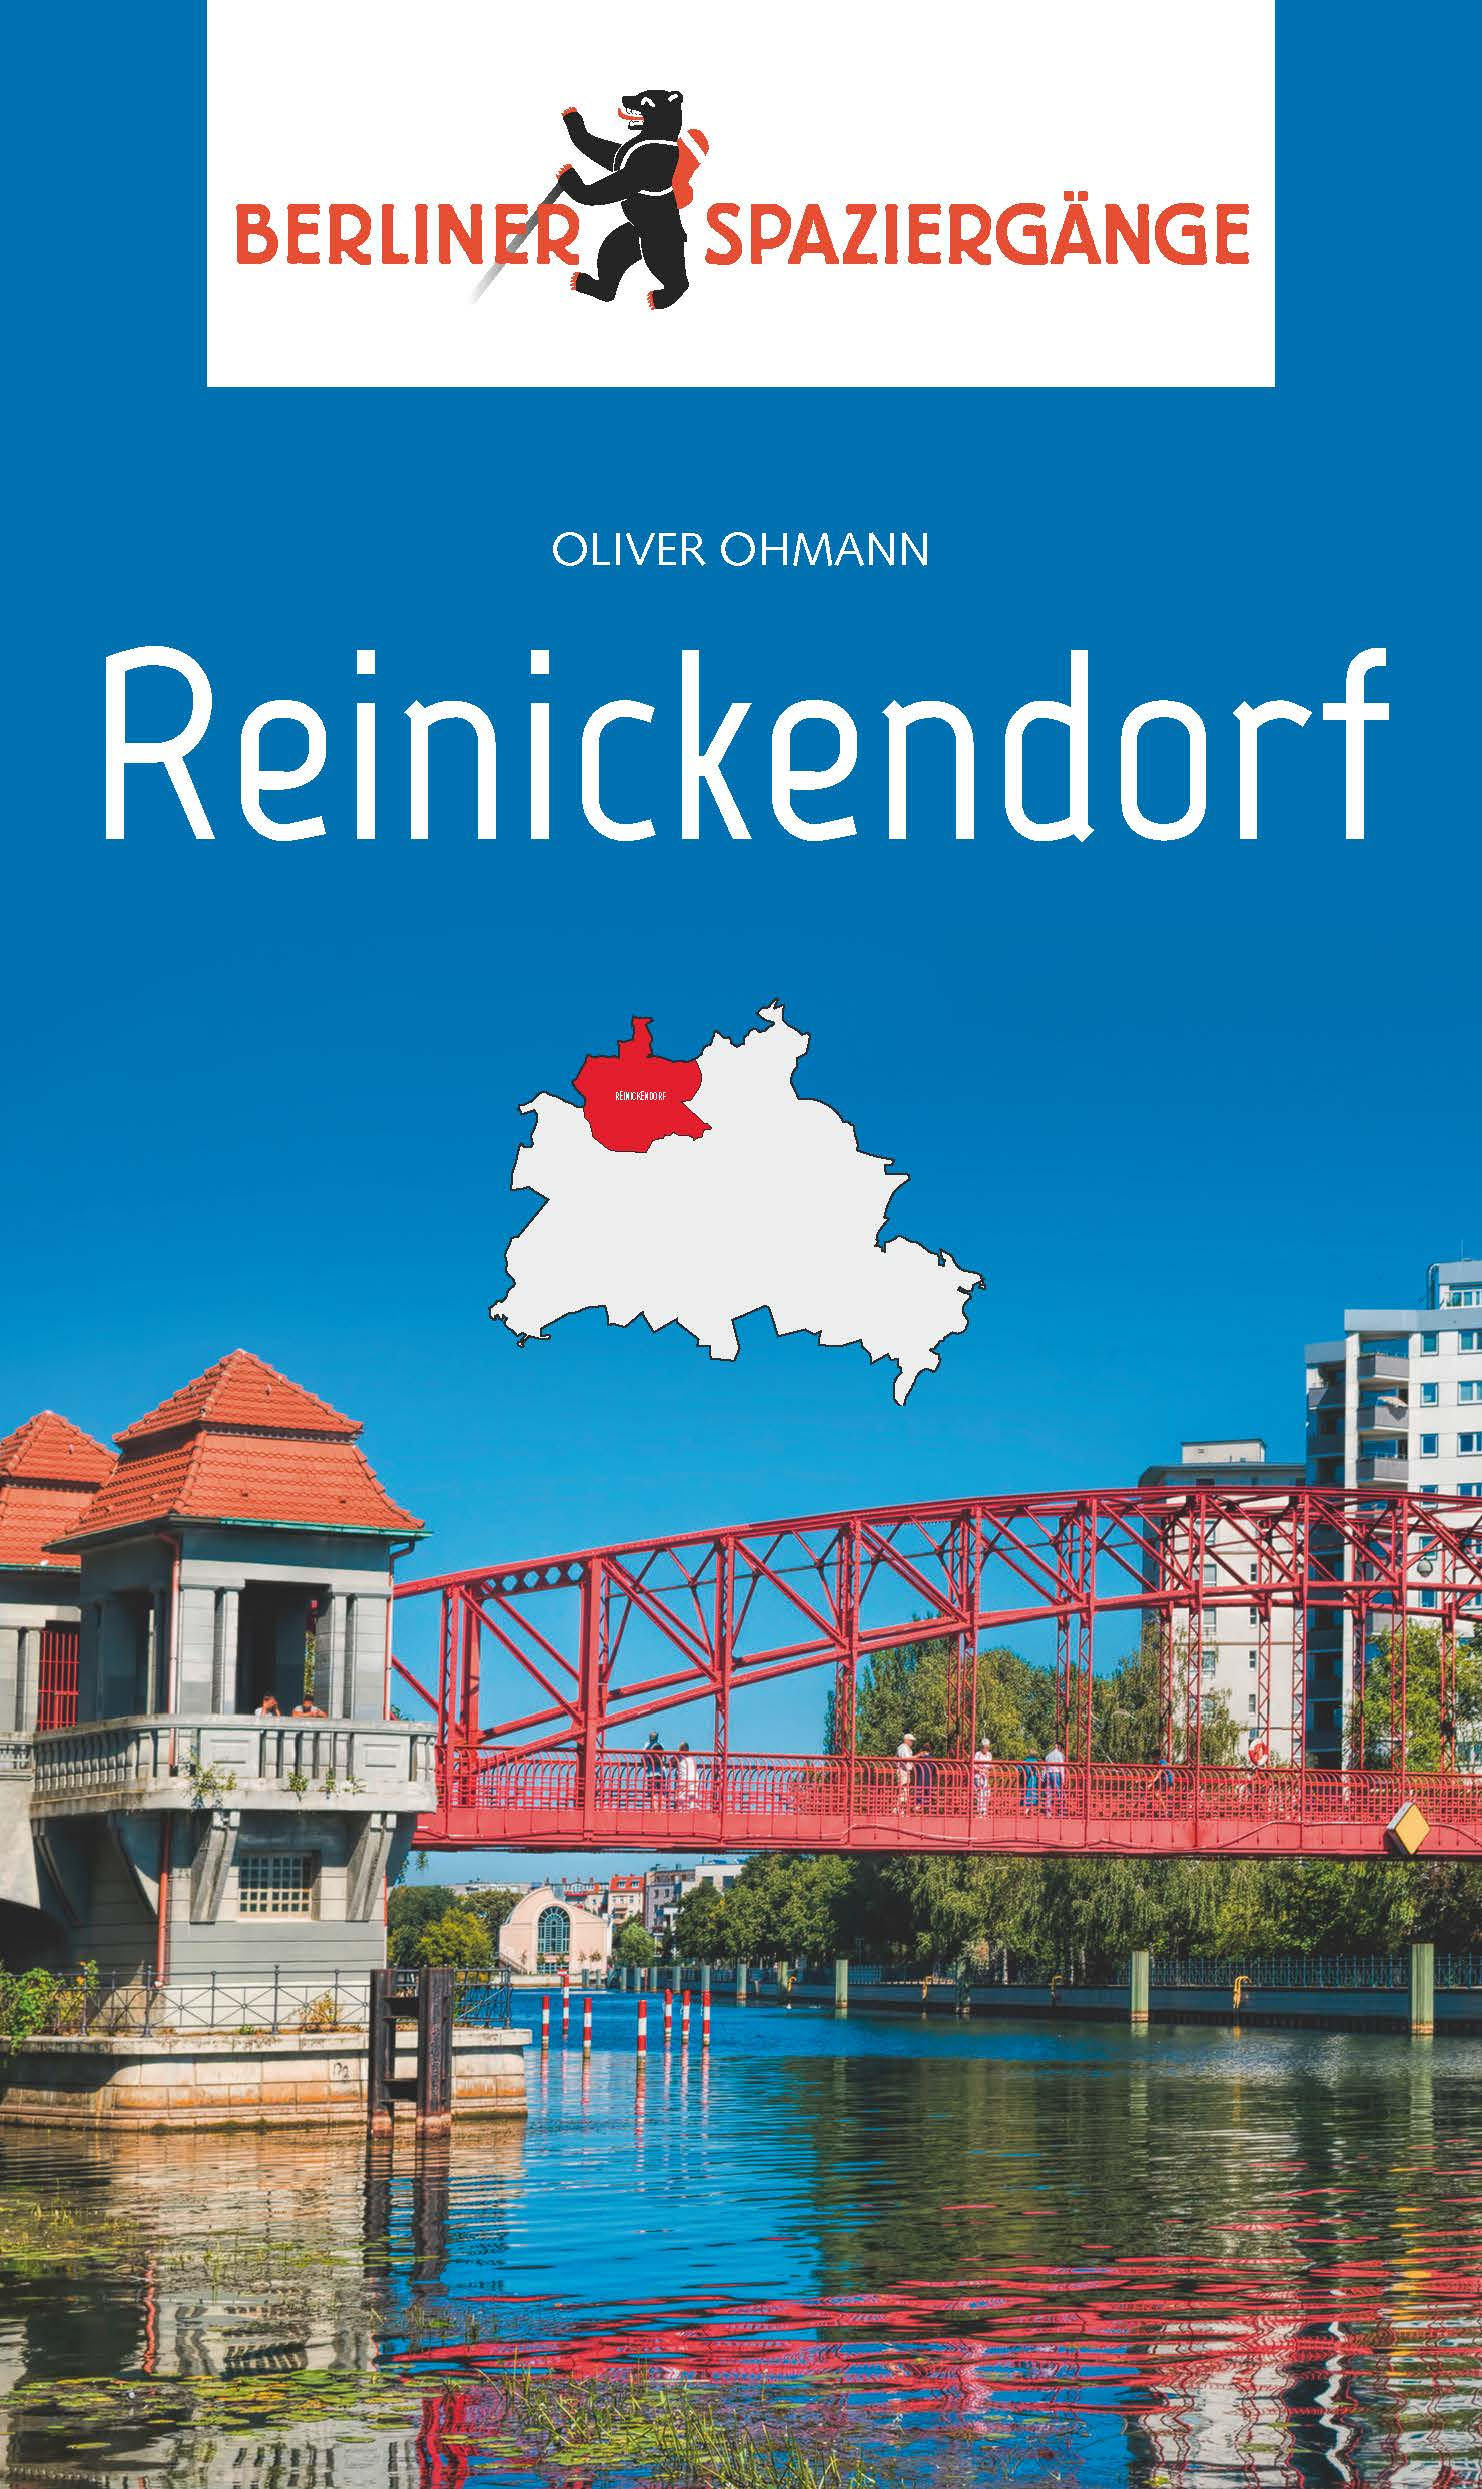 Berlin Spaziergänge Reinickendorf